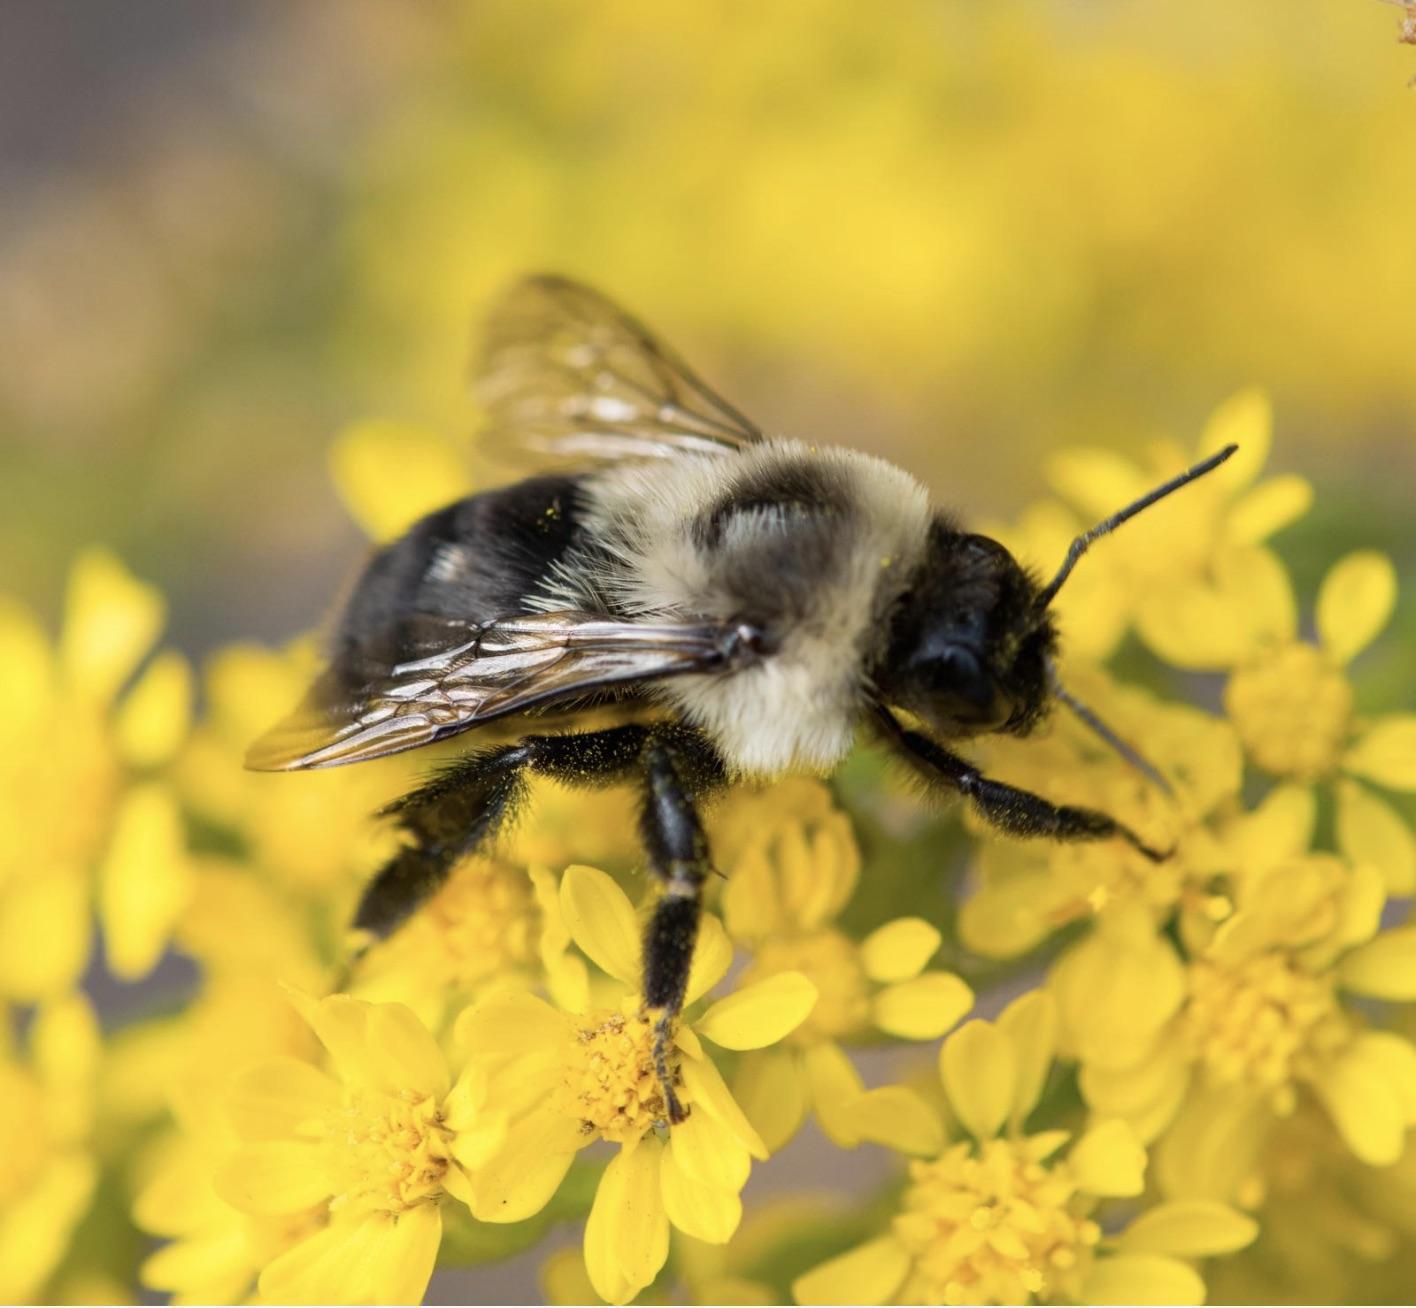 Common eastern bumble bee Photo by Jacob Zadik